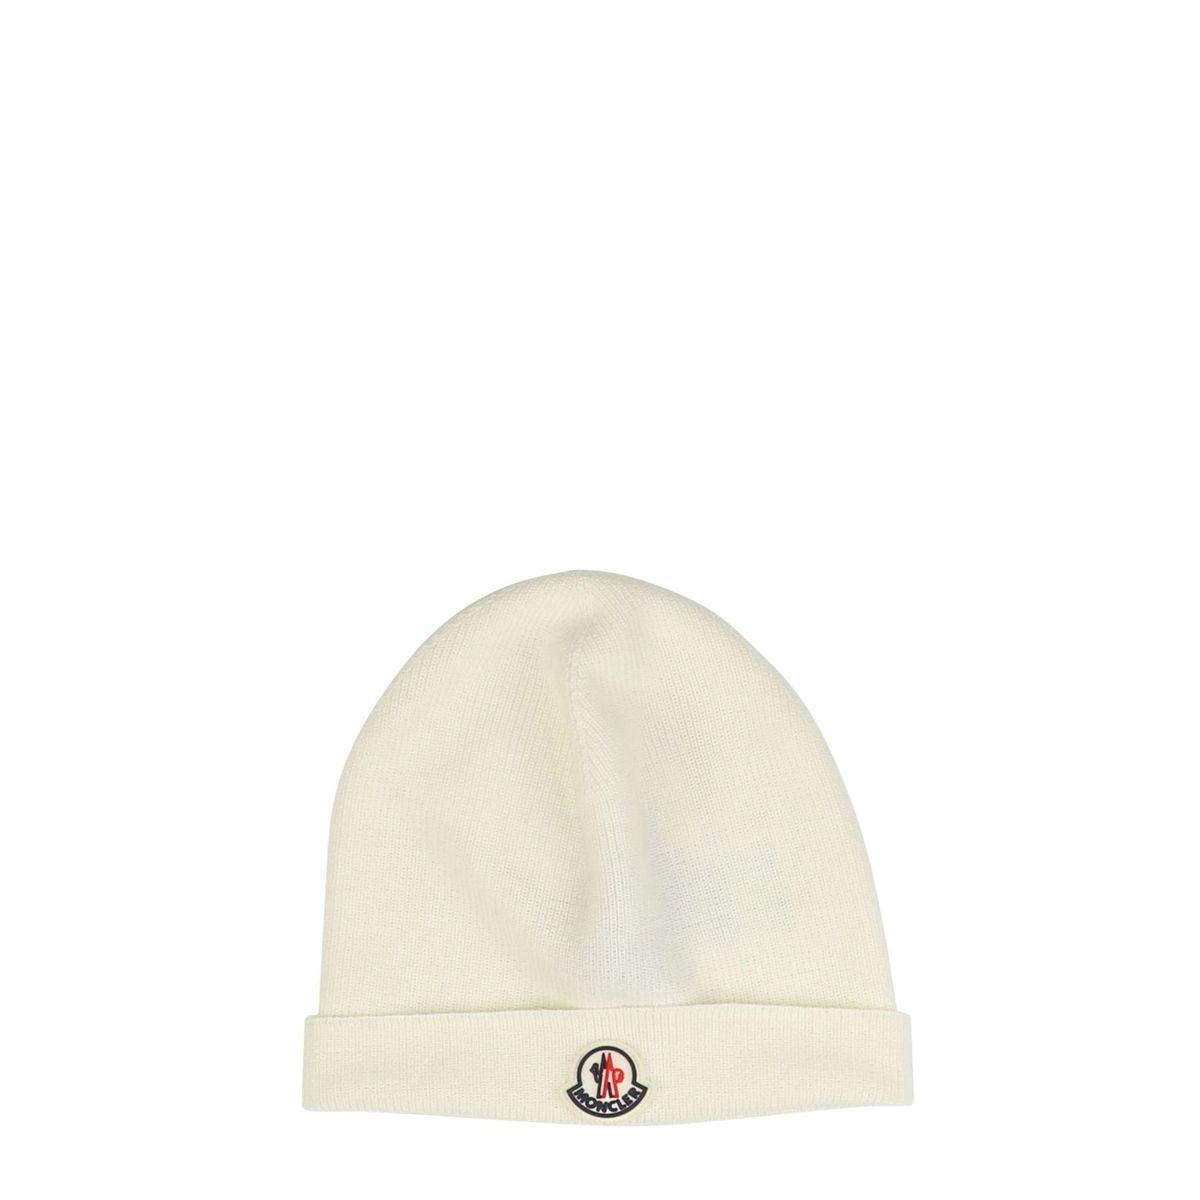 1. Moncler cap in wool blend Cream Moncler